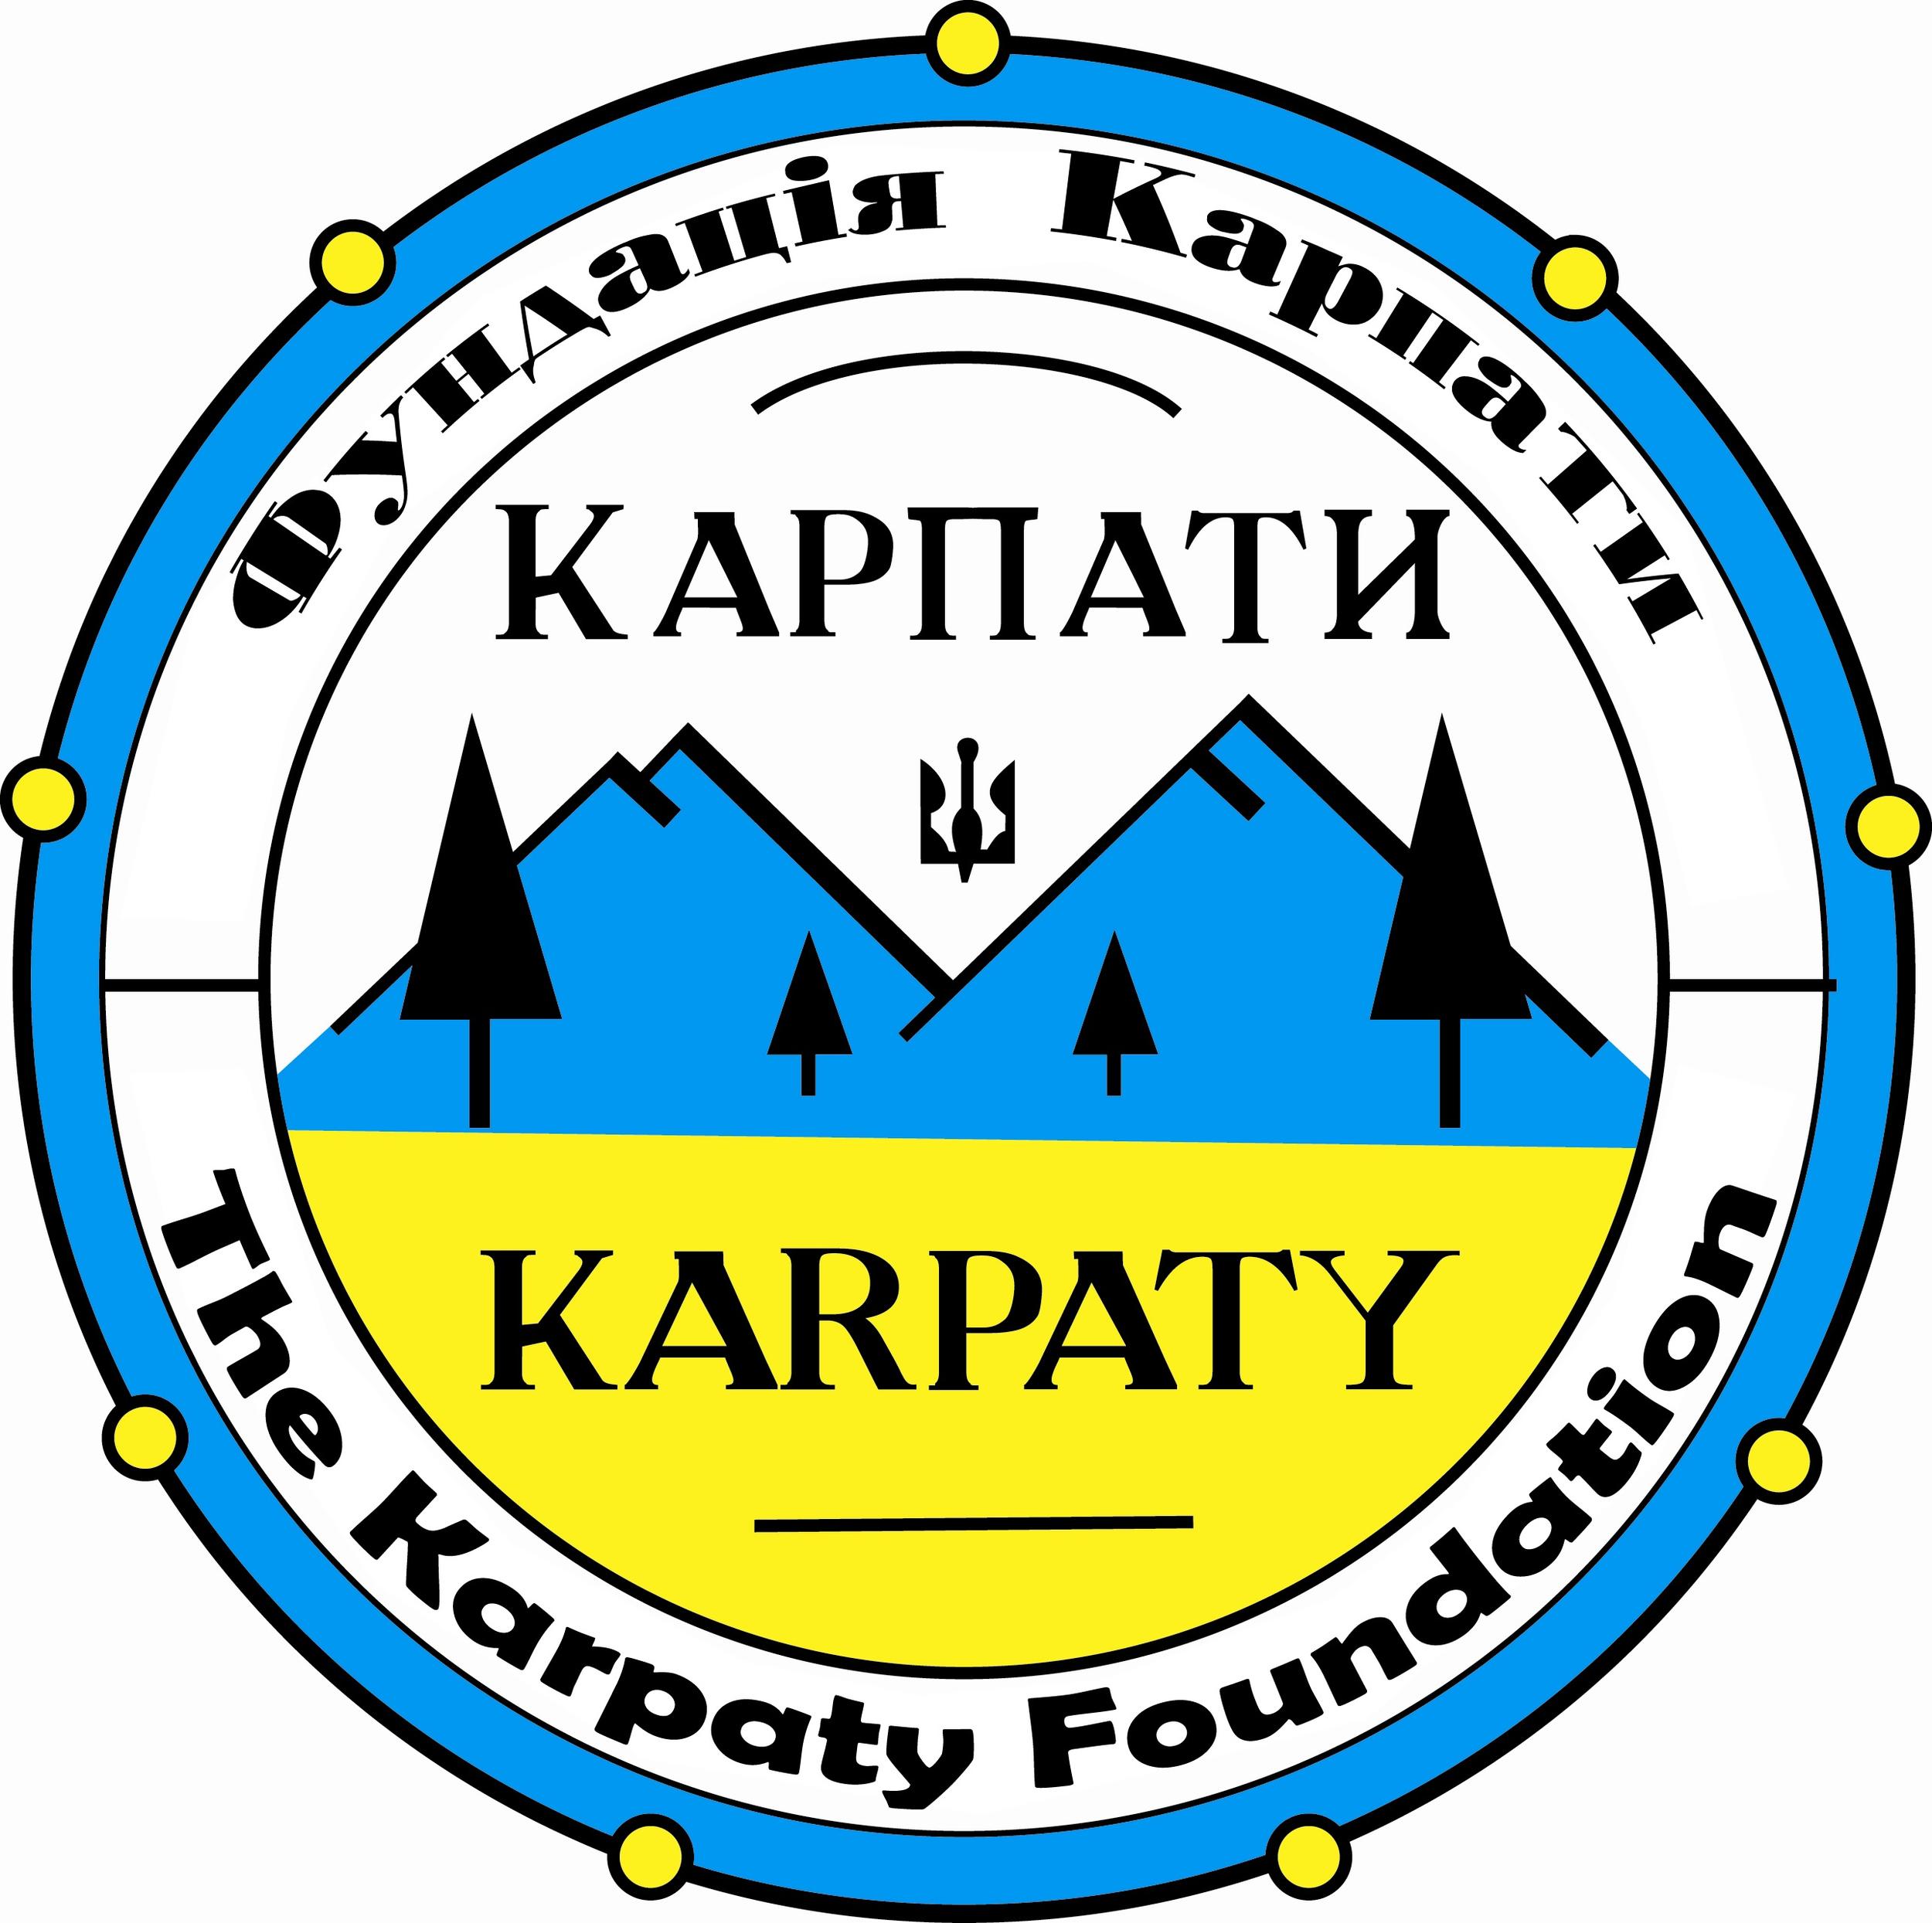 КАРПАТИ ЛОҐО kARPATY logo.png